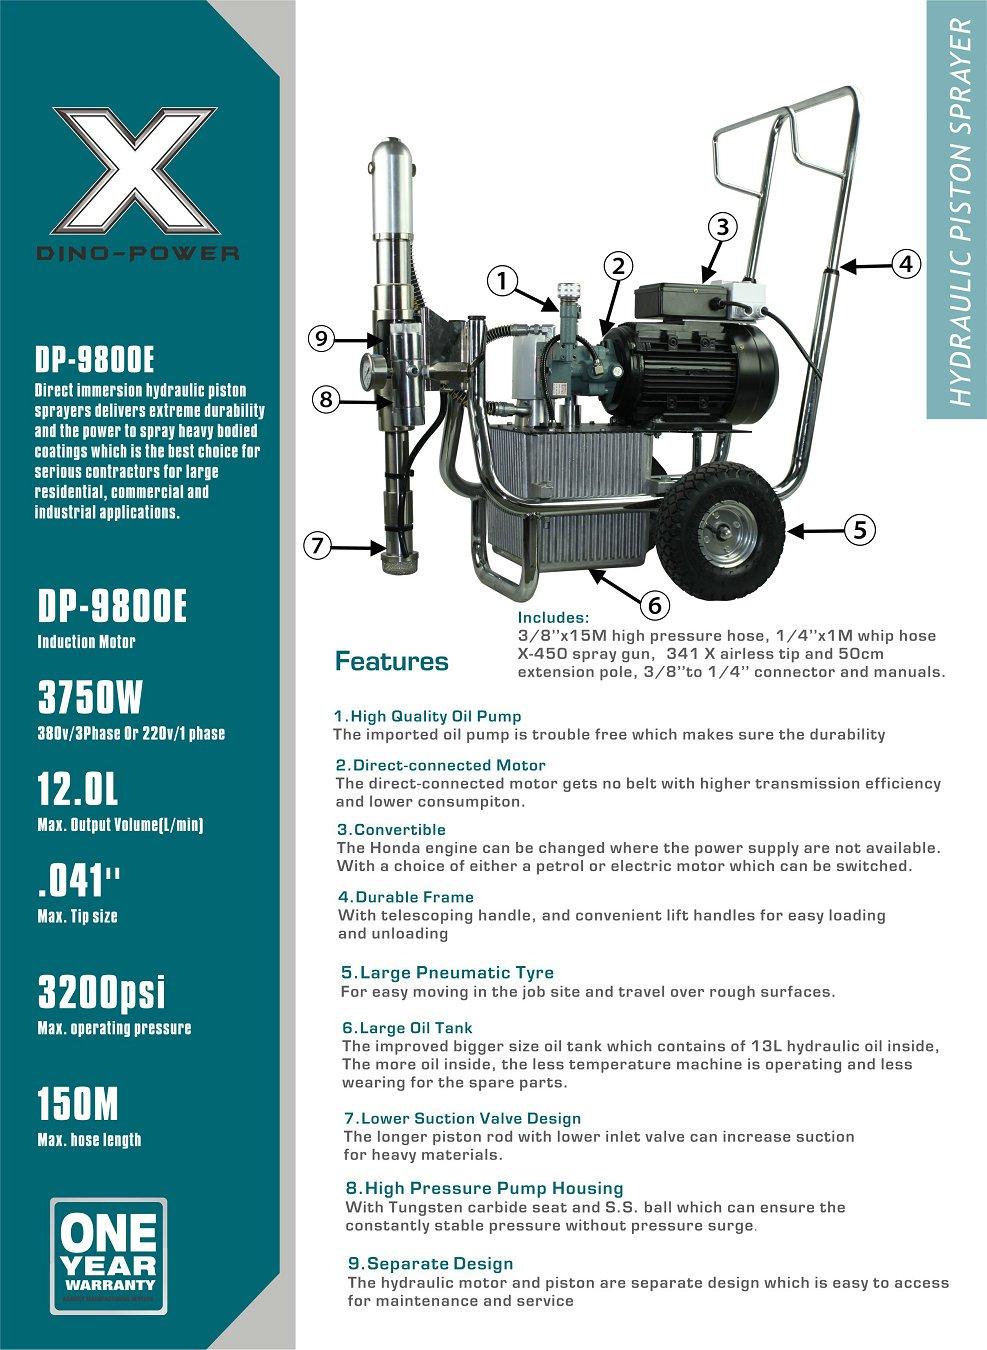 DP-9800E AIRLESS hydraulic paint sprayer